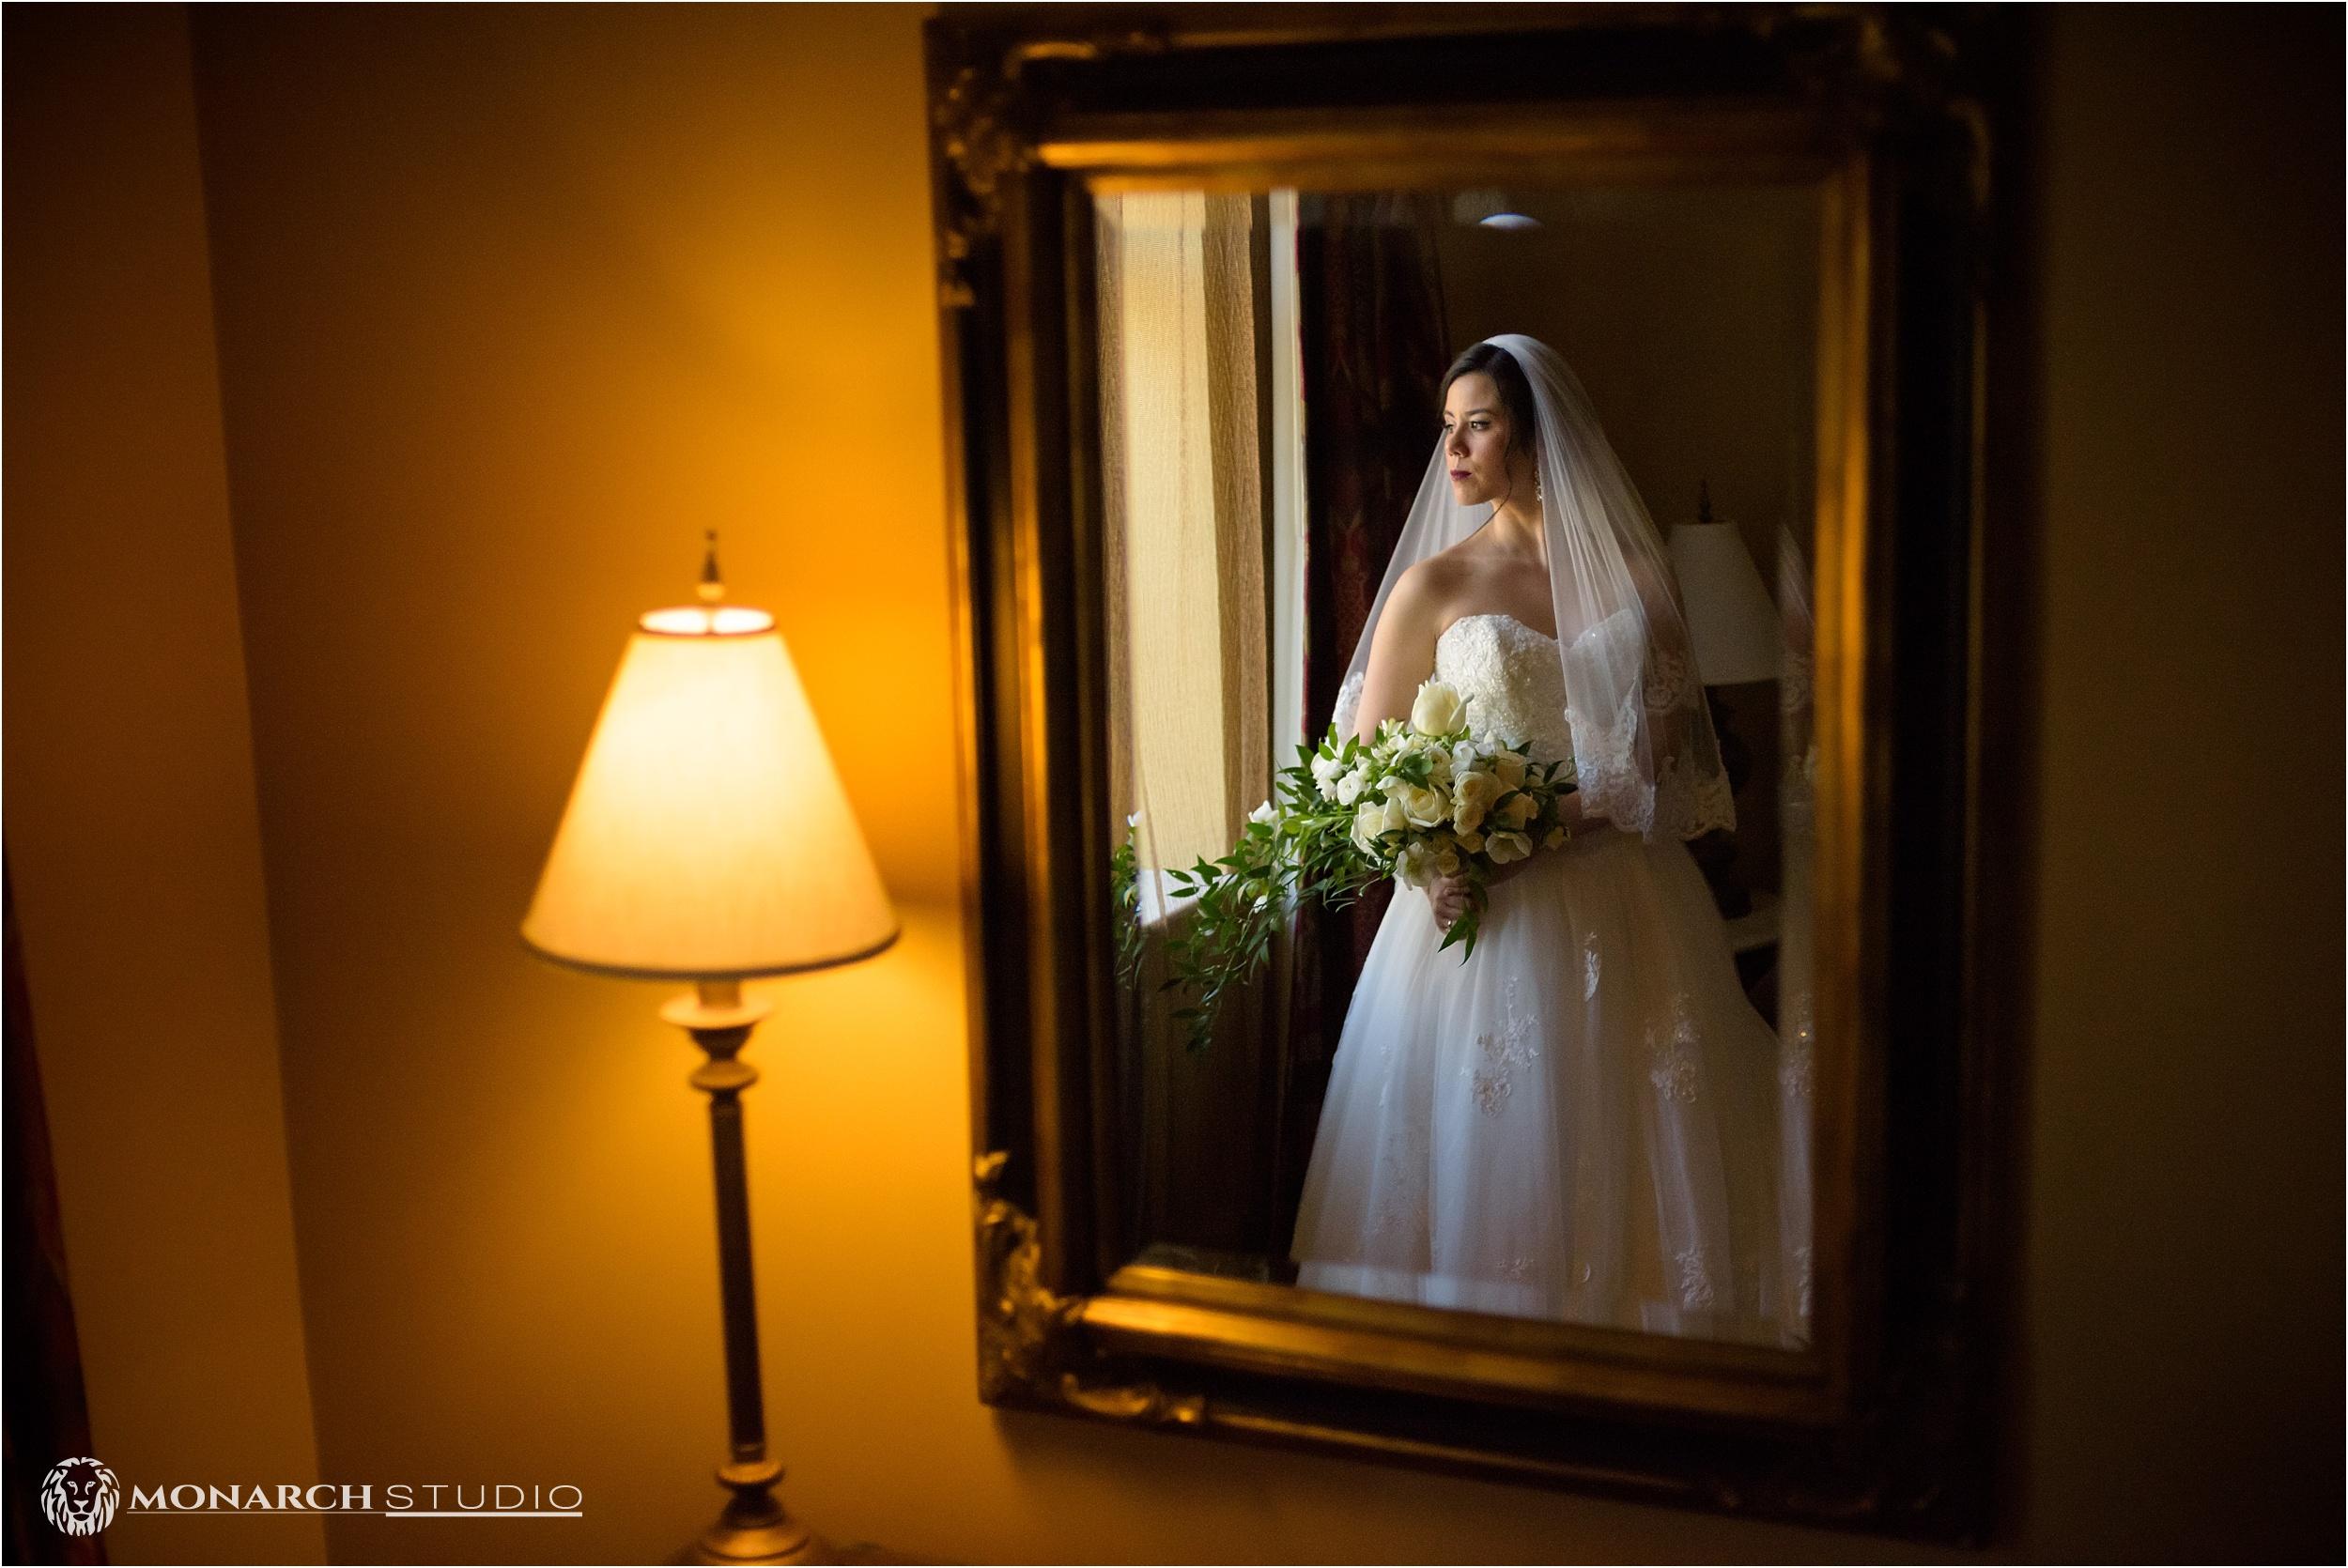 wedding-photographer-in-st-augustine-florida-treasury-016.jpg